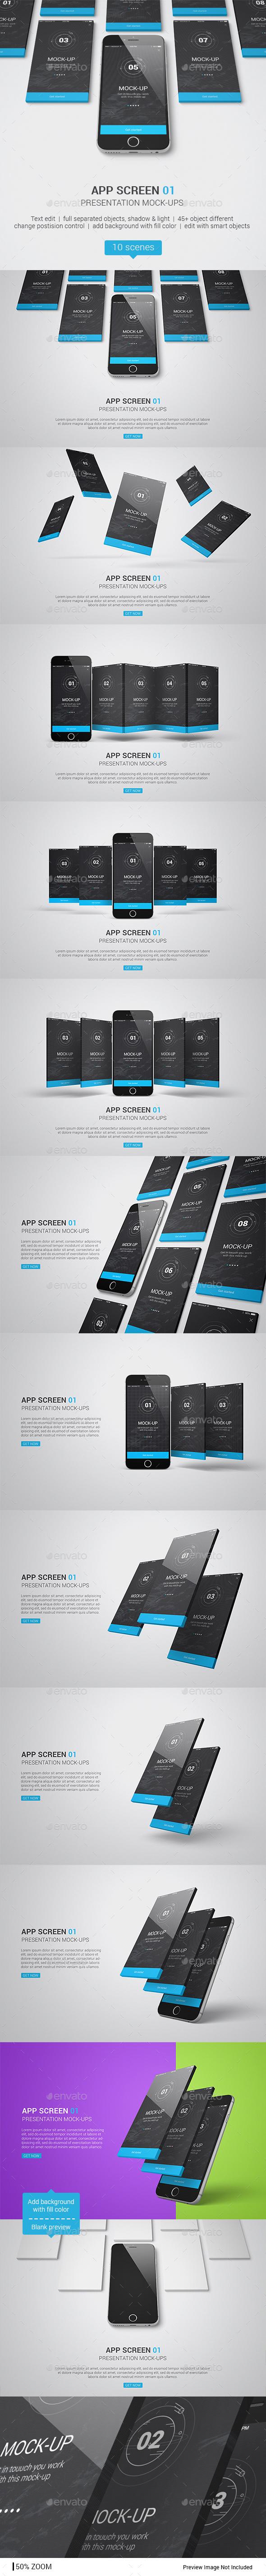 GraphicRiver App Screen Mockup 20567124